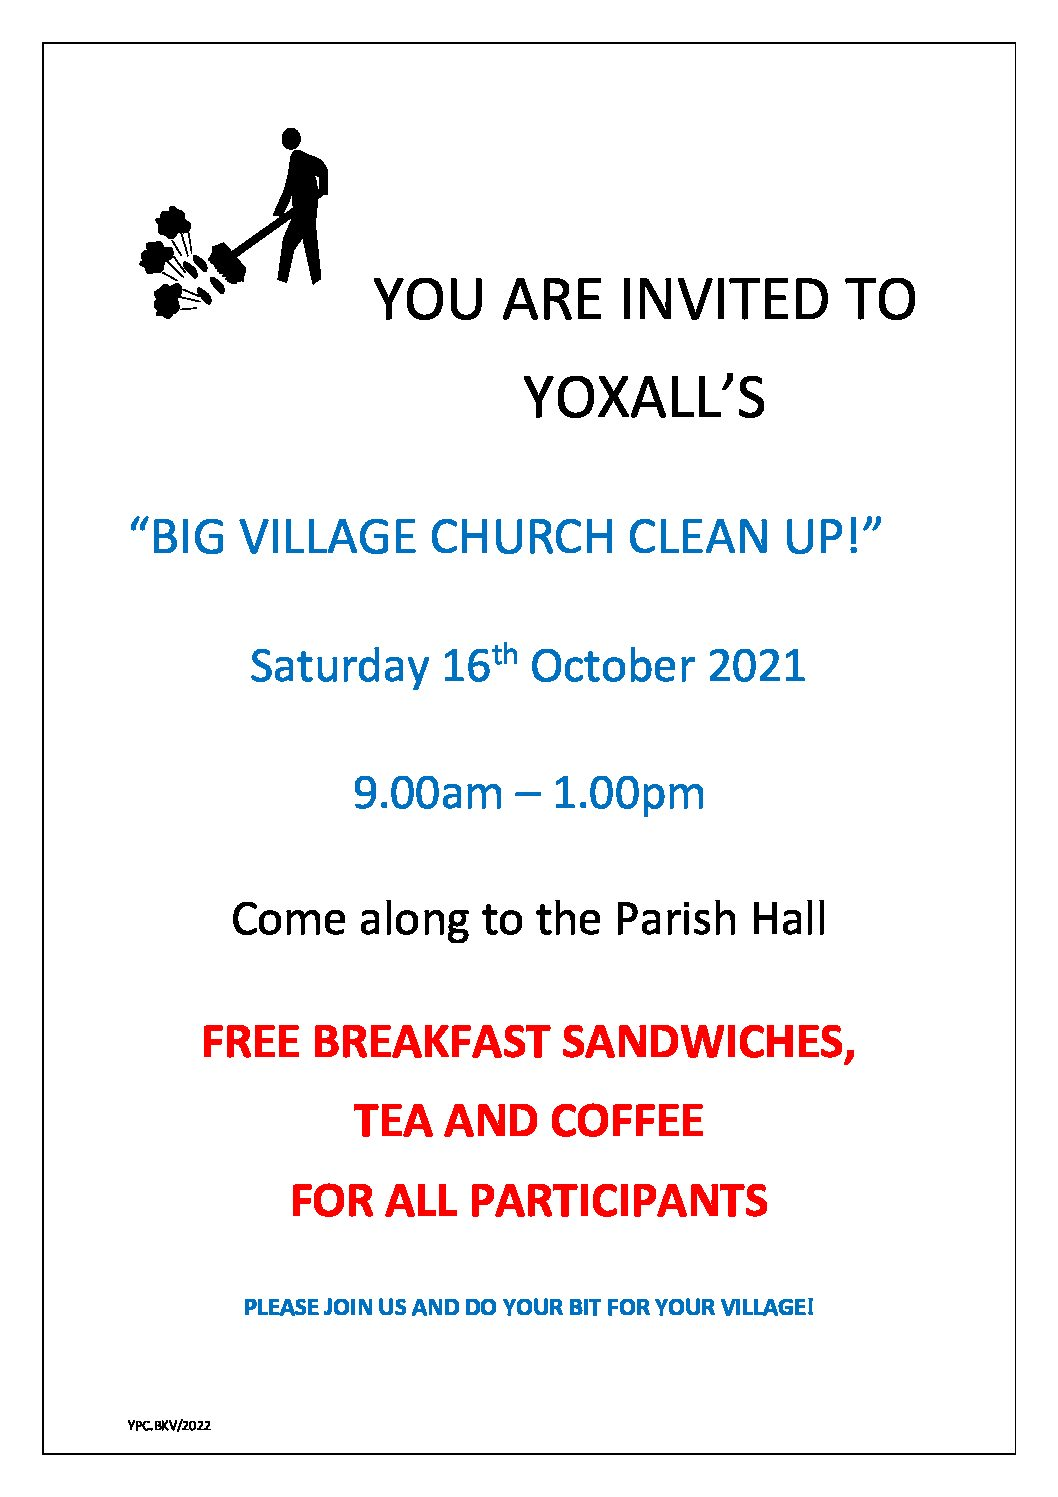 Big Village Church Clean up – Saturday 16th October 2021